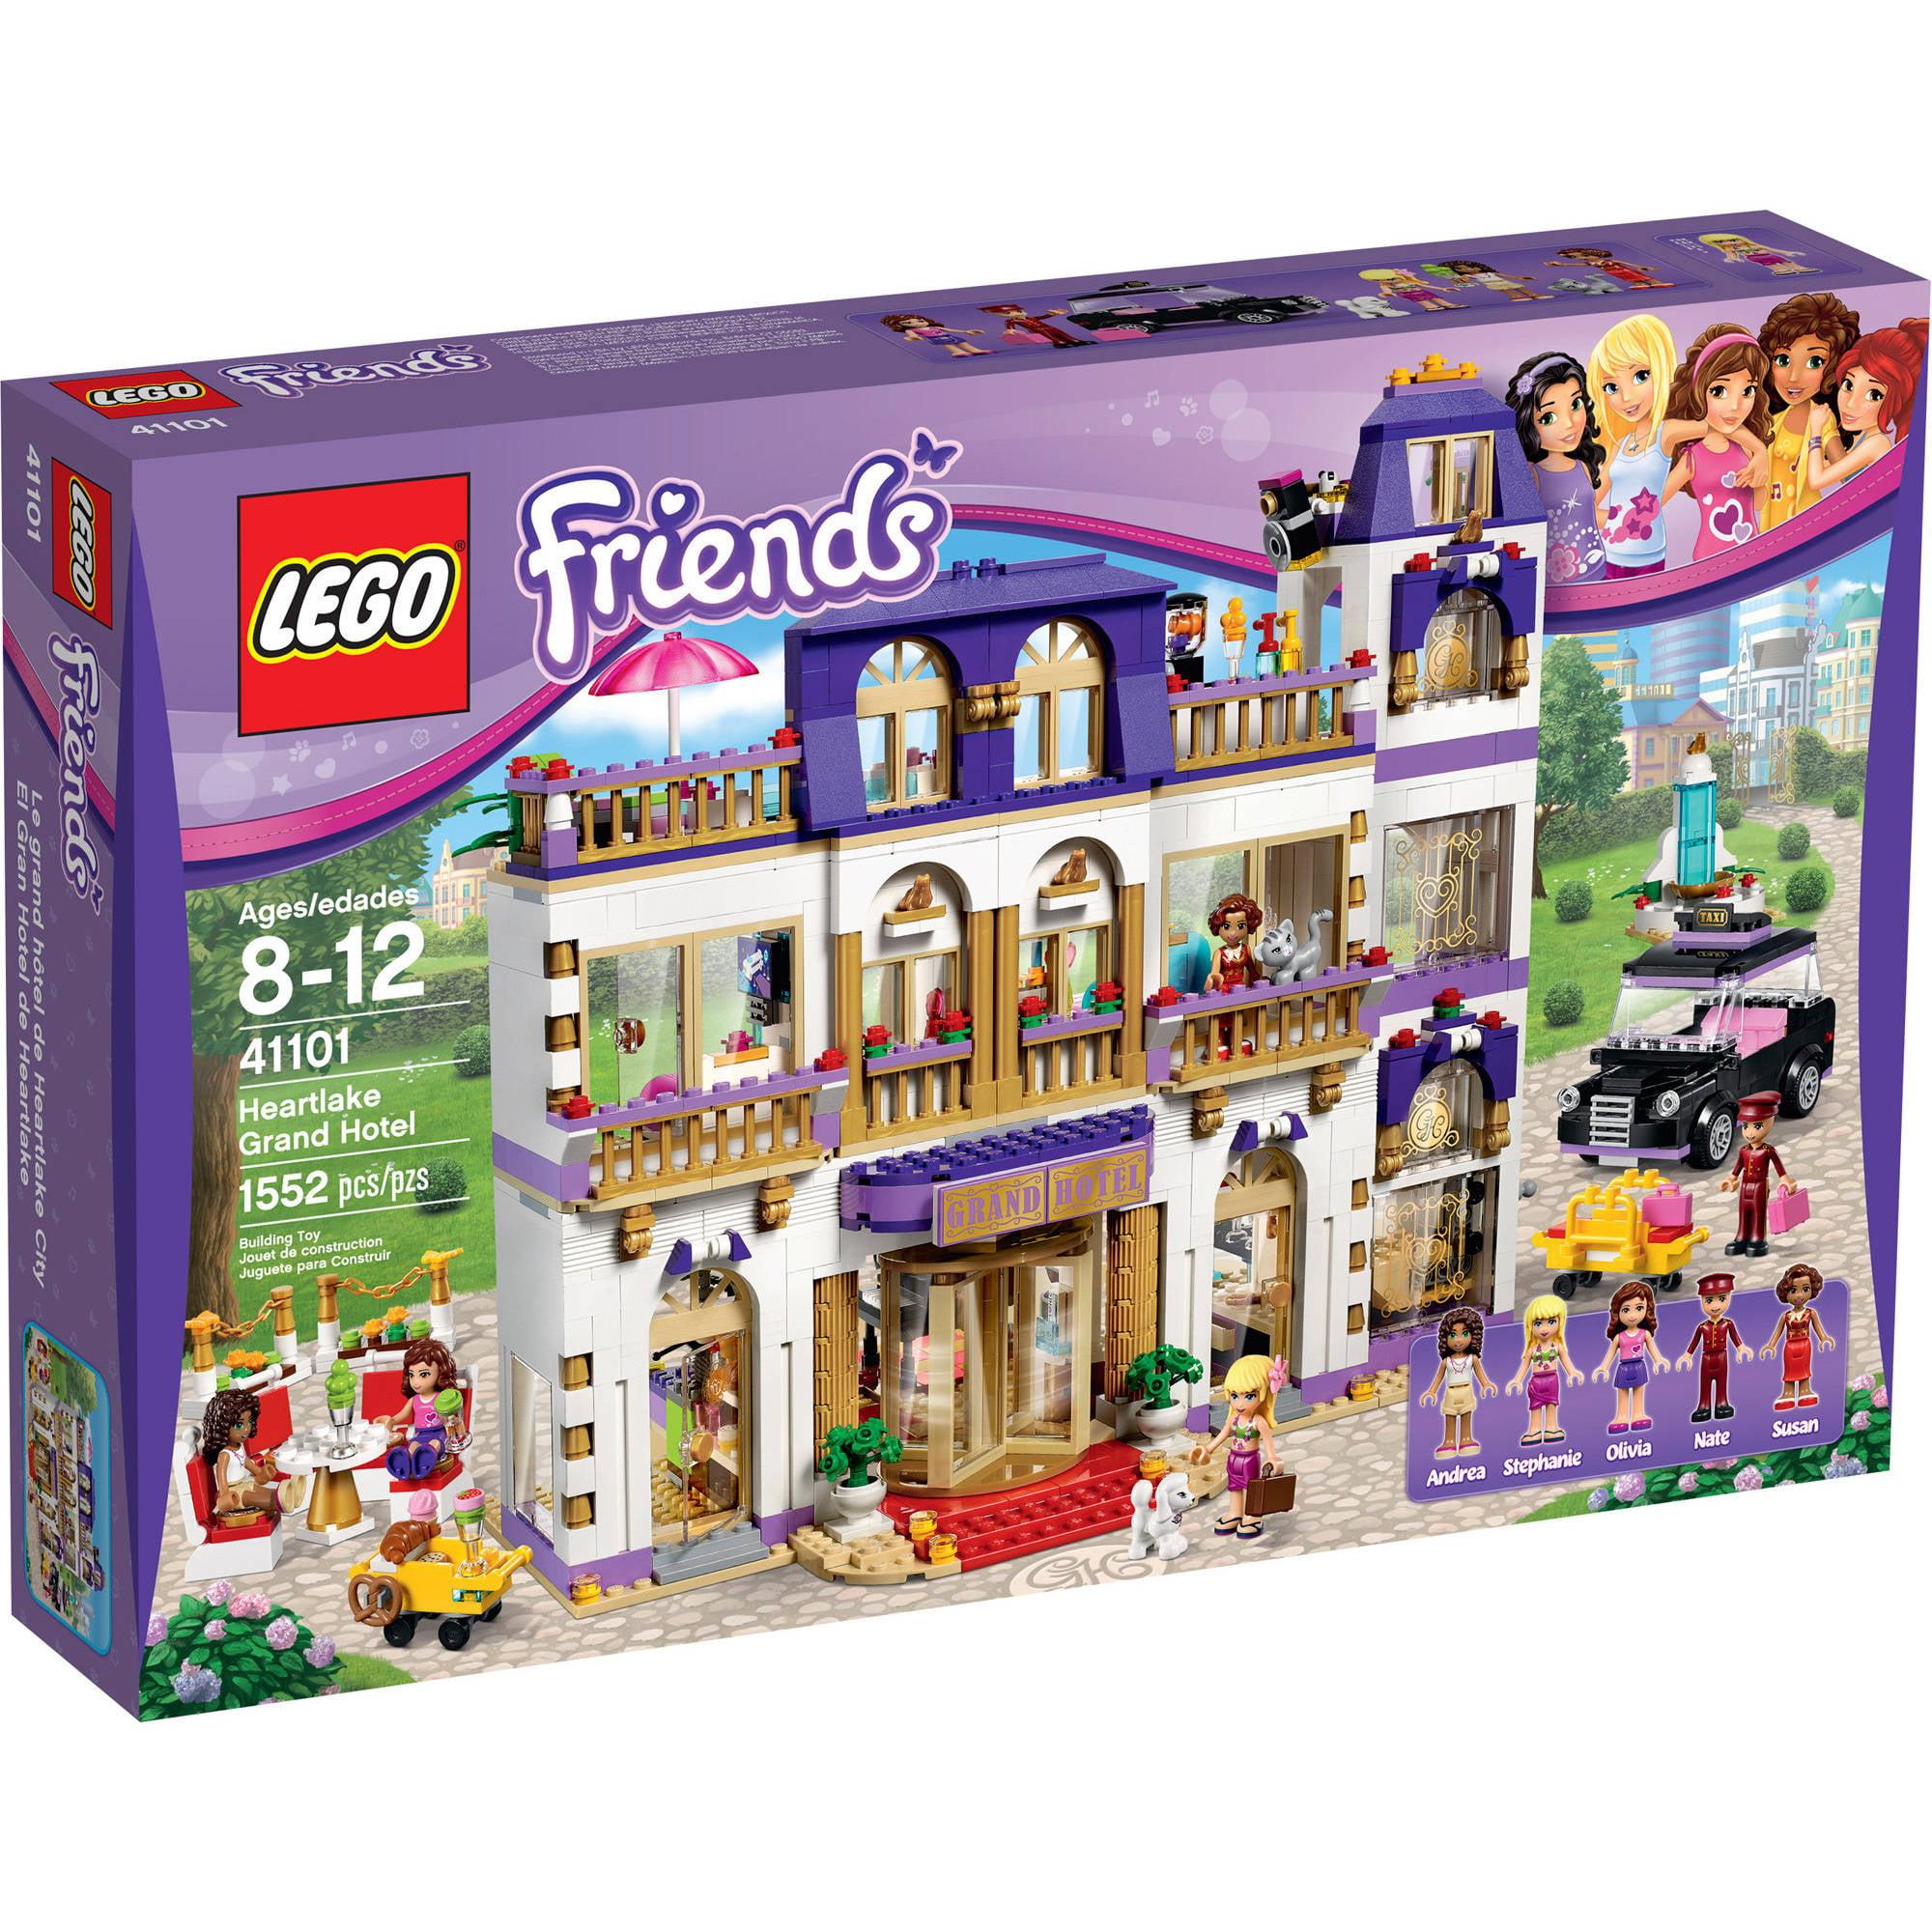 LEGO Friends Heartlake Grand Hotel, 41101